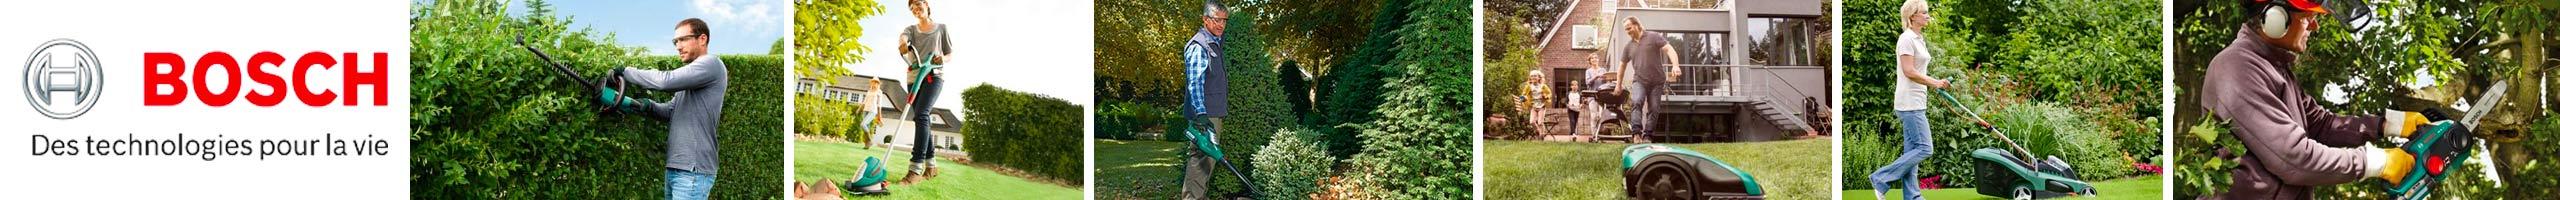 Test et avis outil bosch jardin pas cher